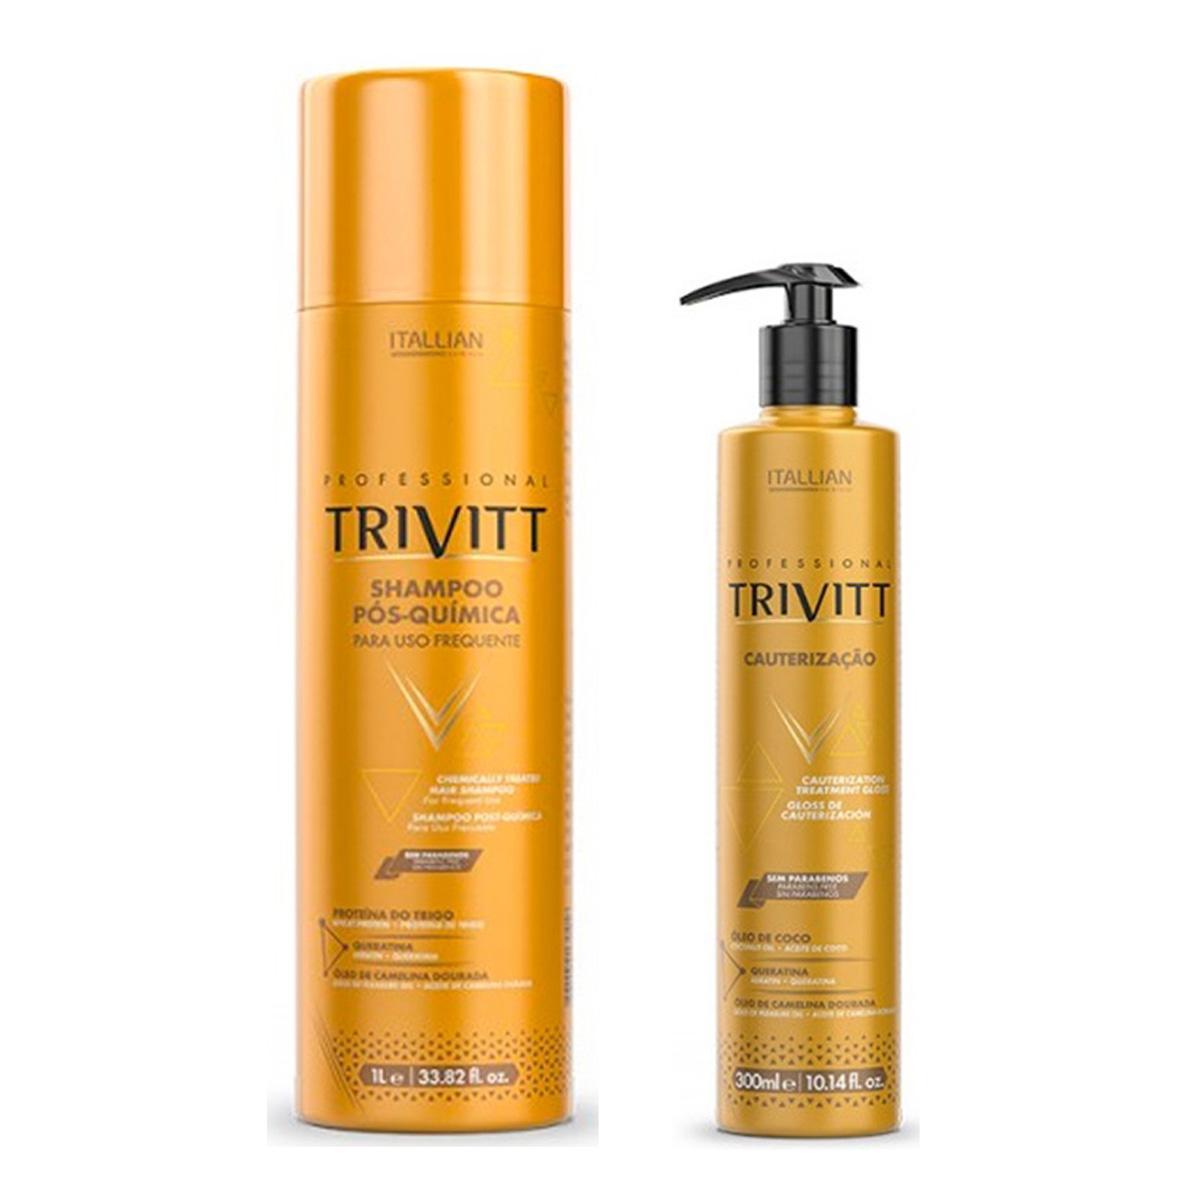 Kit Trivitt Shampoo Pós Quimica 1 Litro + Cauterização 300ml